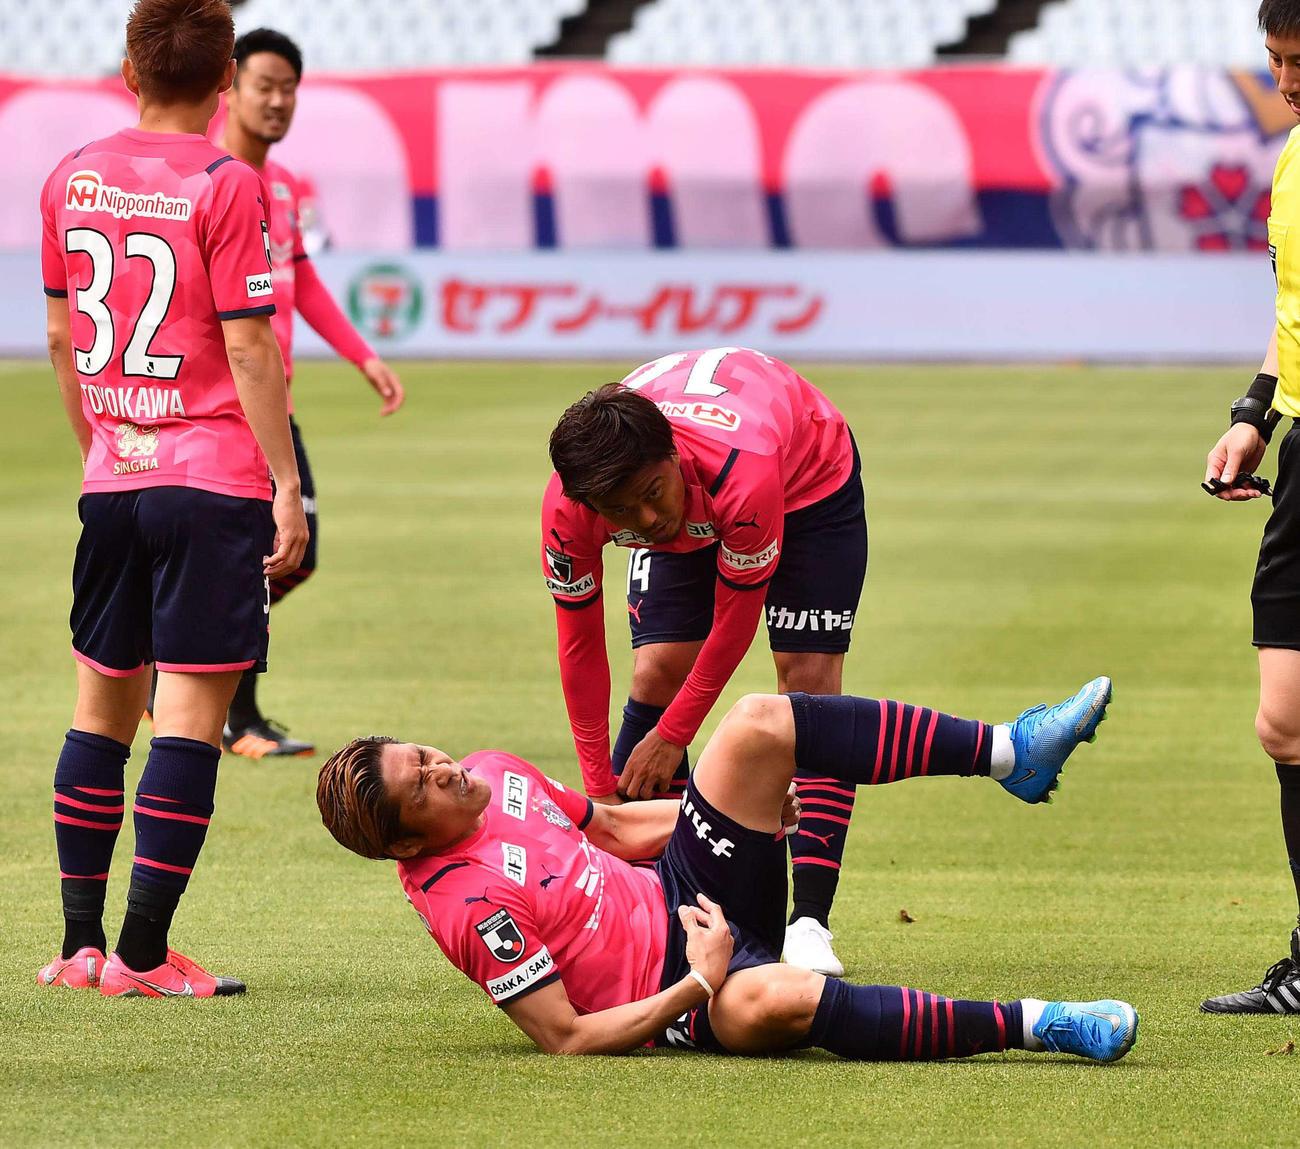 C大阪対G大阪 前半、左足を負傷して倒れ込むC大阪大久保(手前)(撮影・上田博志)